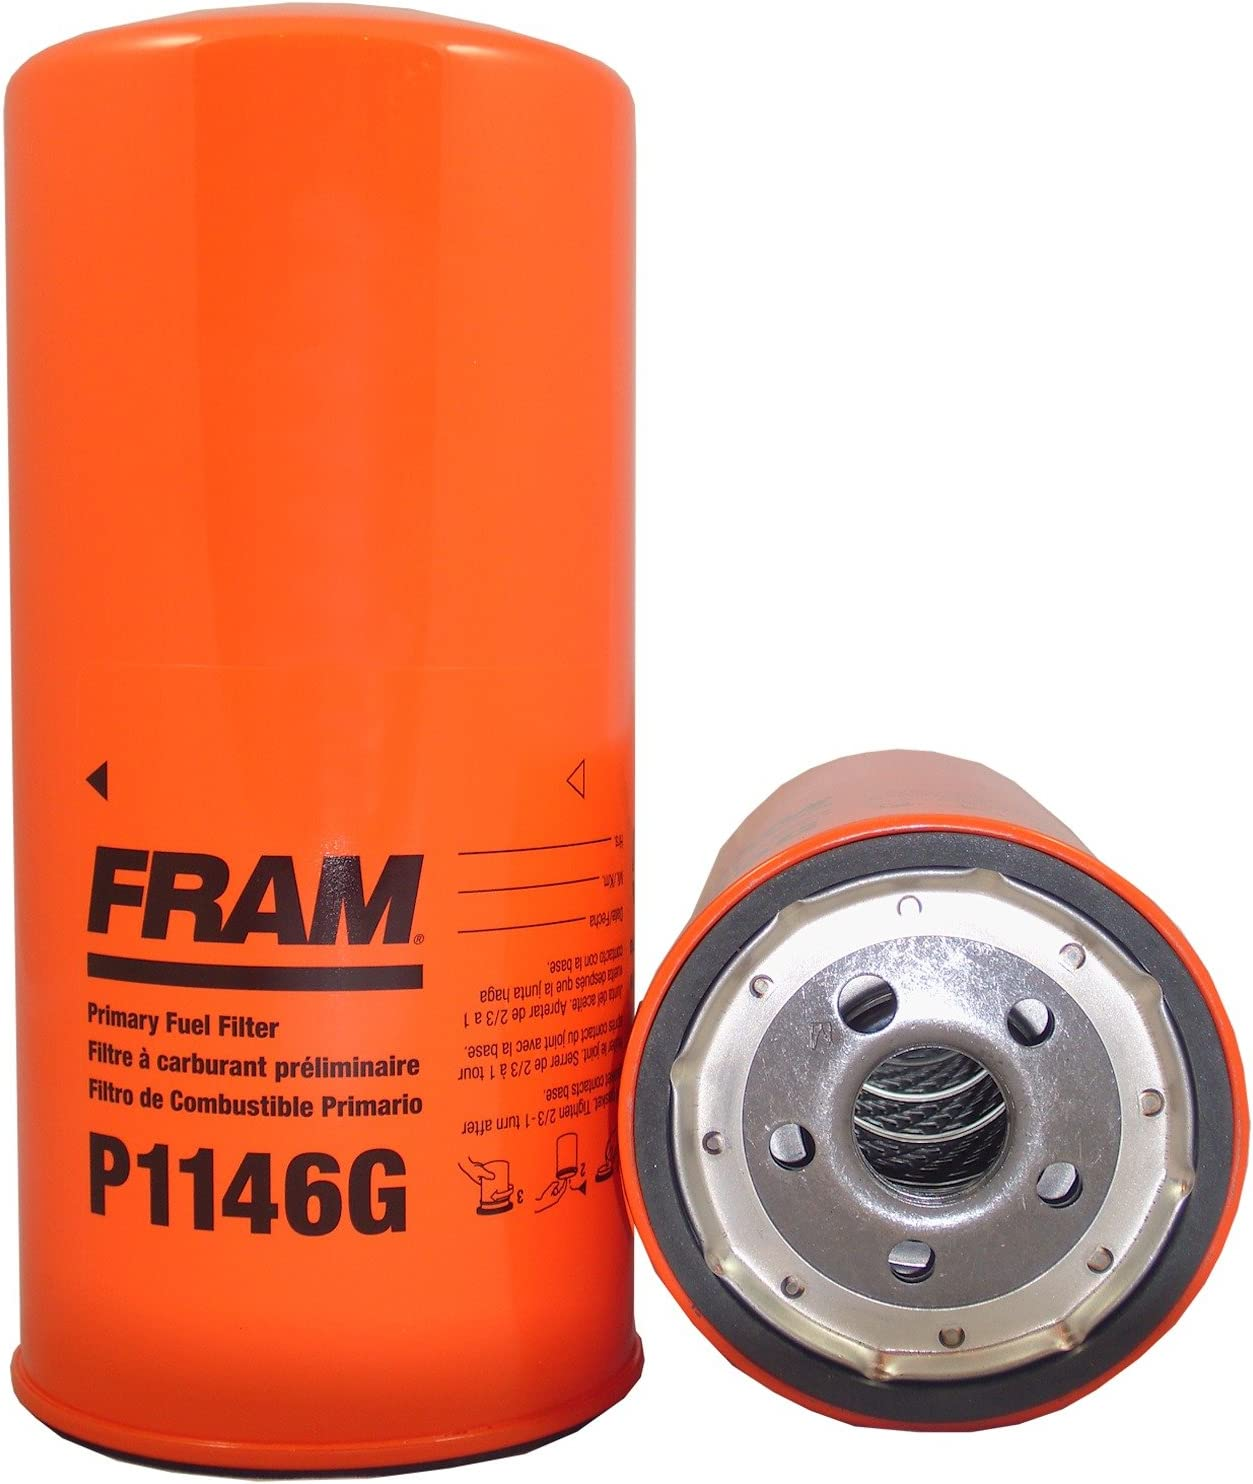 amazon.com: fram p1146g fuel filter: automotive  amazon.com